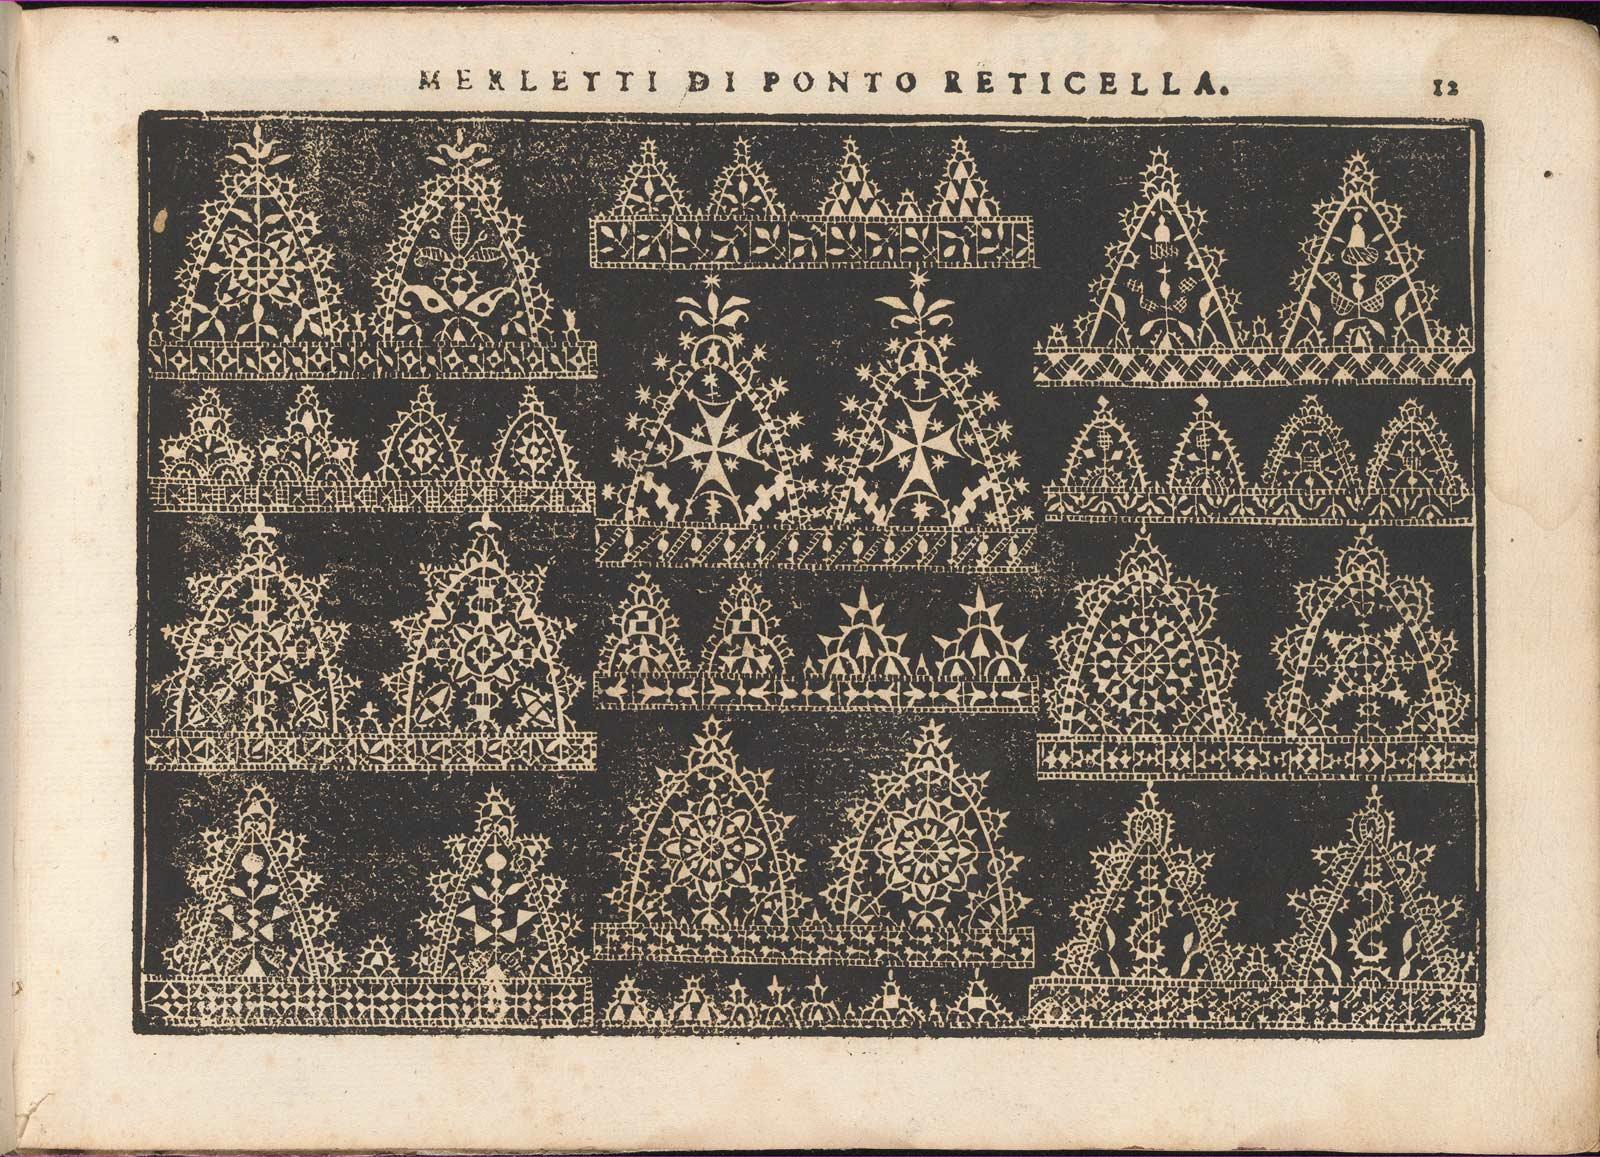 A page from Teatro delle Nobili et Virtuose Donne, 1616. Woodcut. Isabella Catanea Parasole